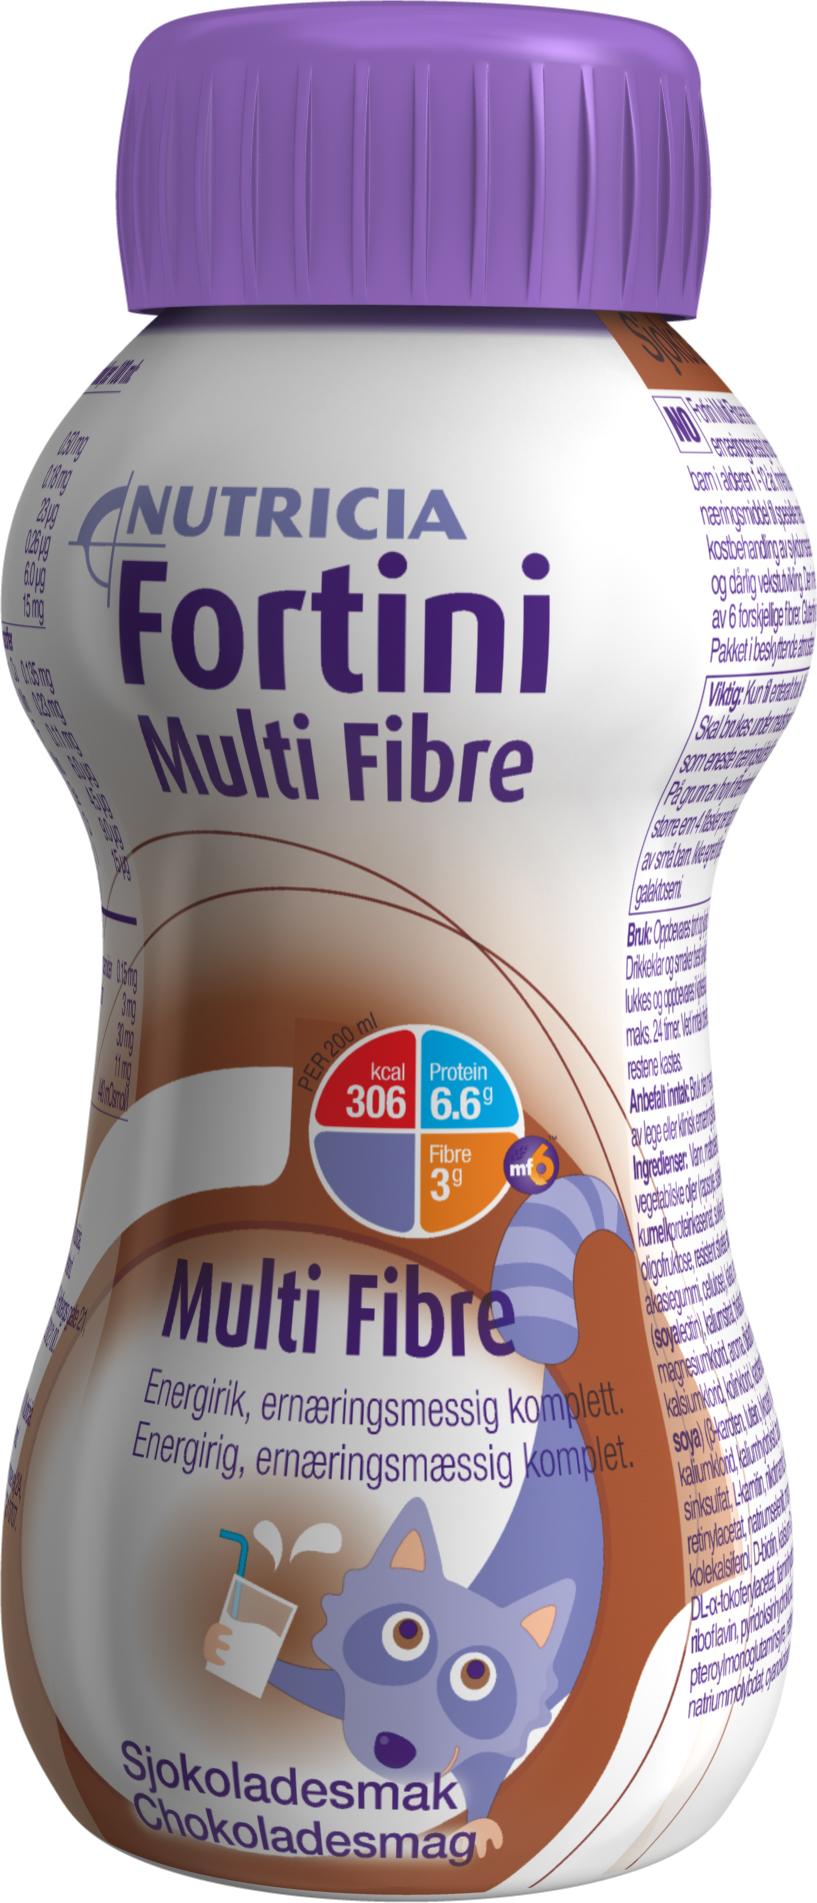 Drikk Fortini Multi Fibre sjokolade 200ml